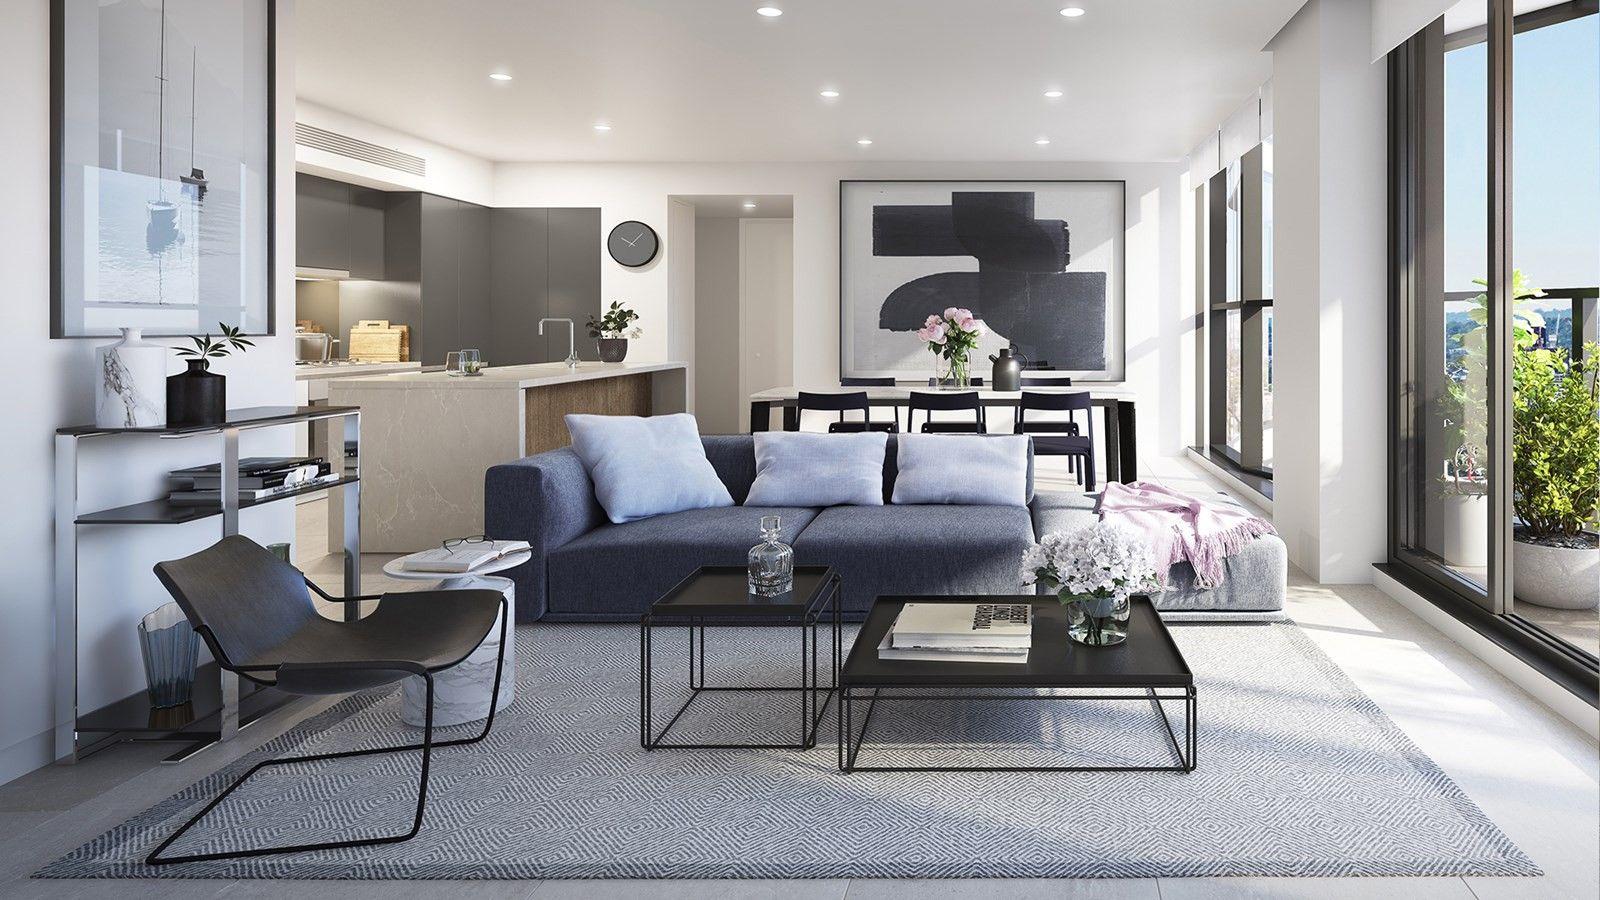 Small Home Living Residential Interior Design Hong Kong Interior